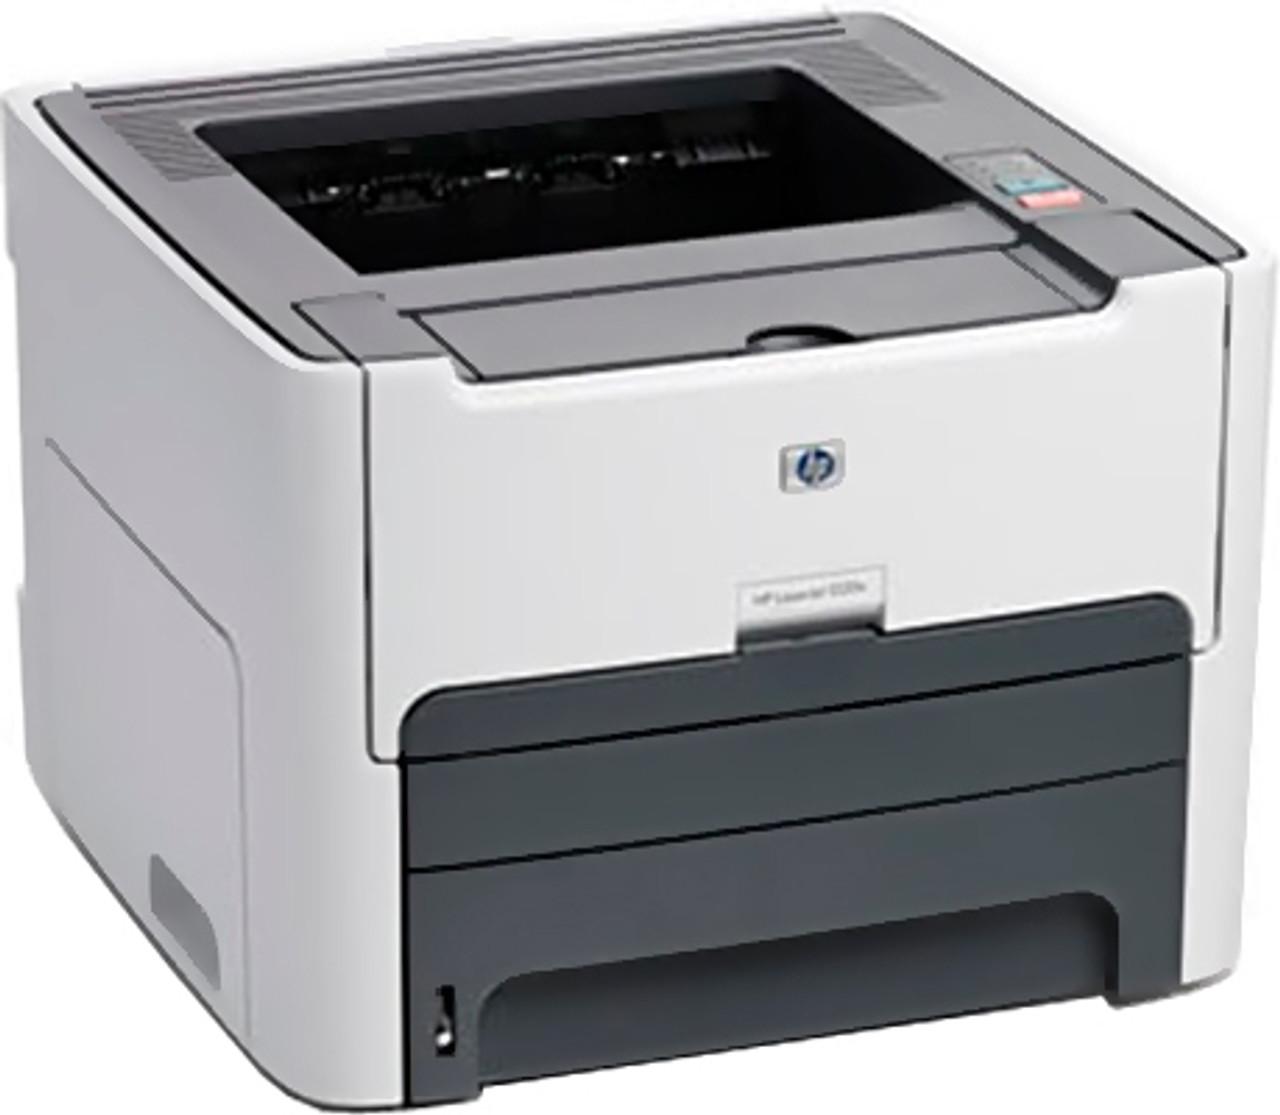 HP LaserJet 1320 Q5927A Personal Up to 22 ppm Monochrome USB Laser Printer